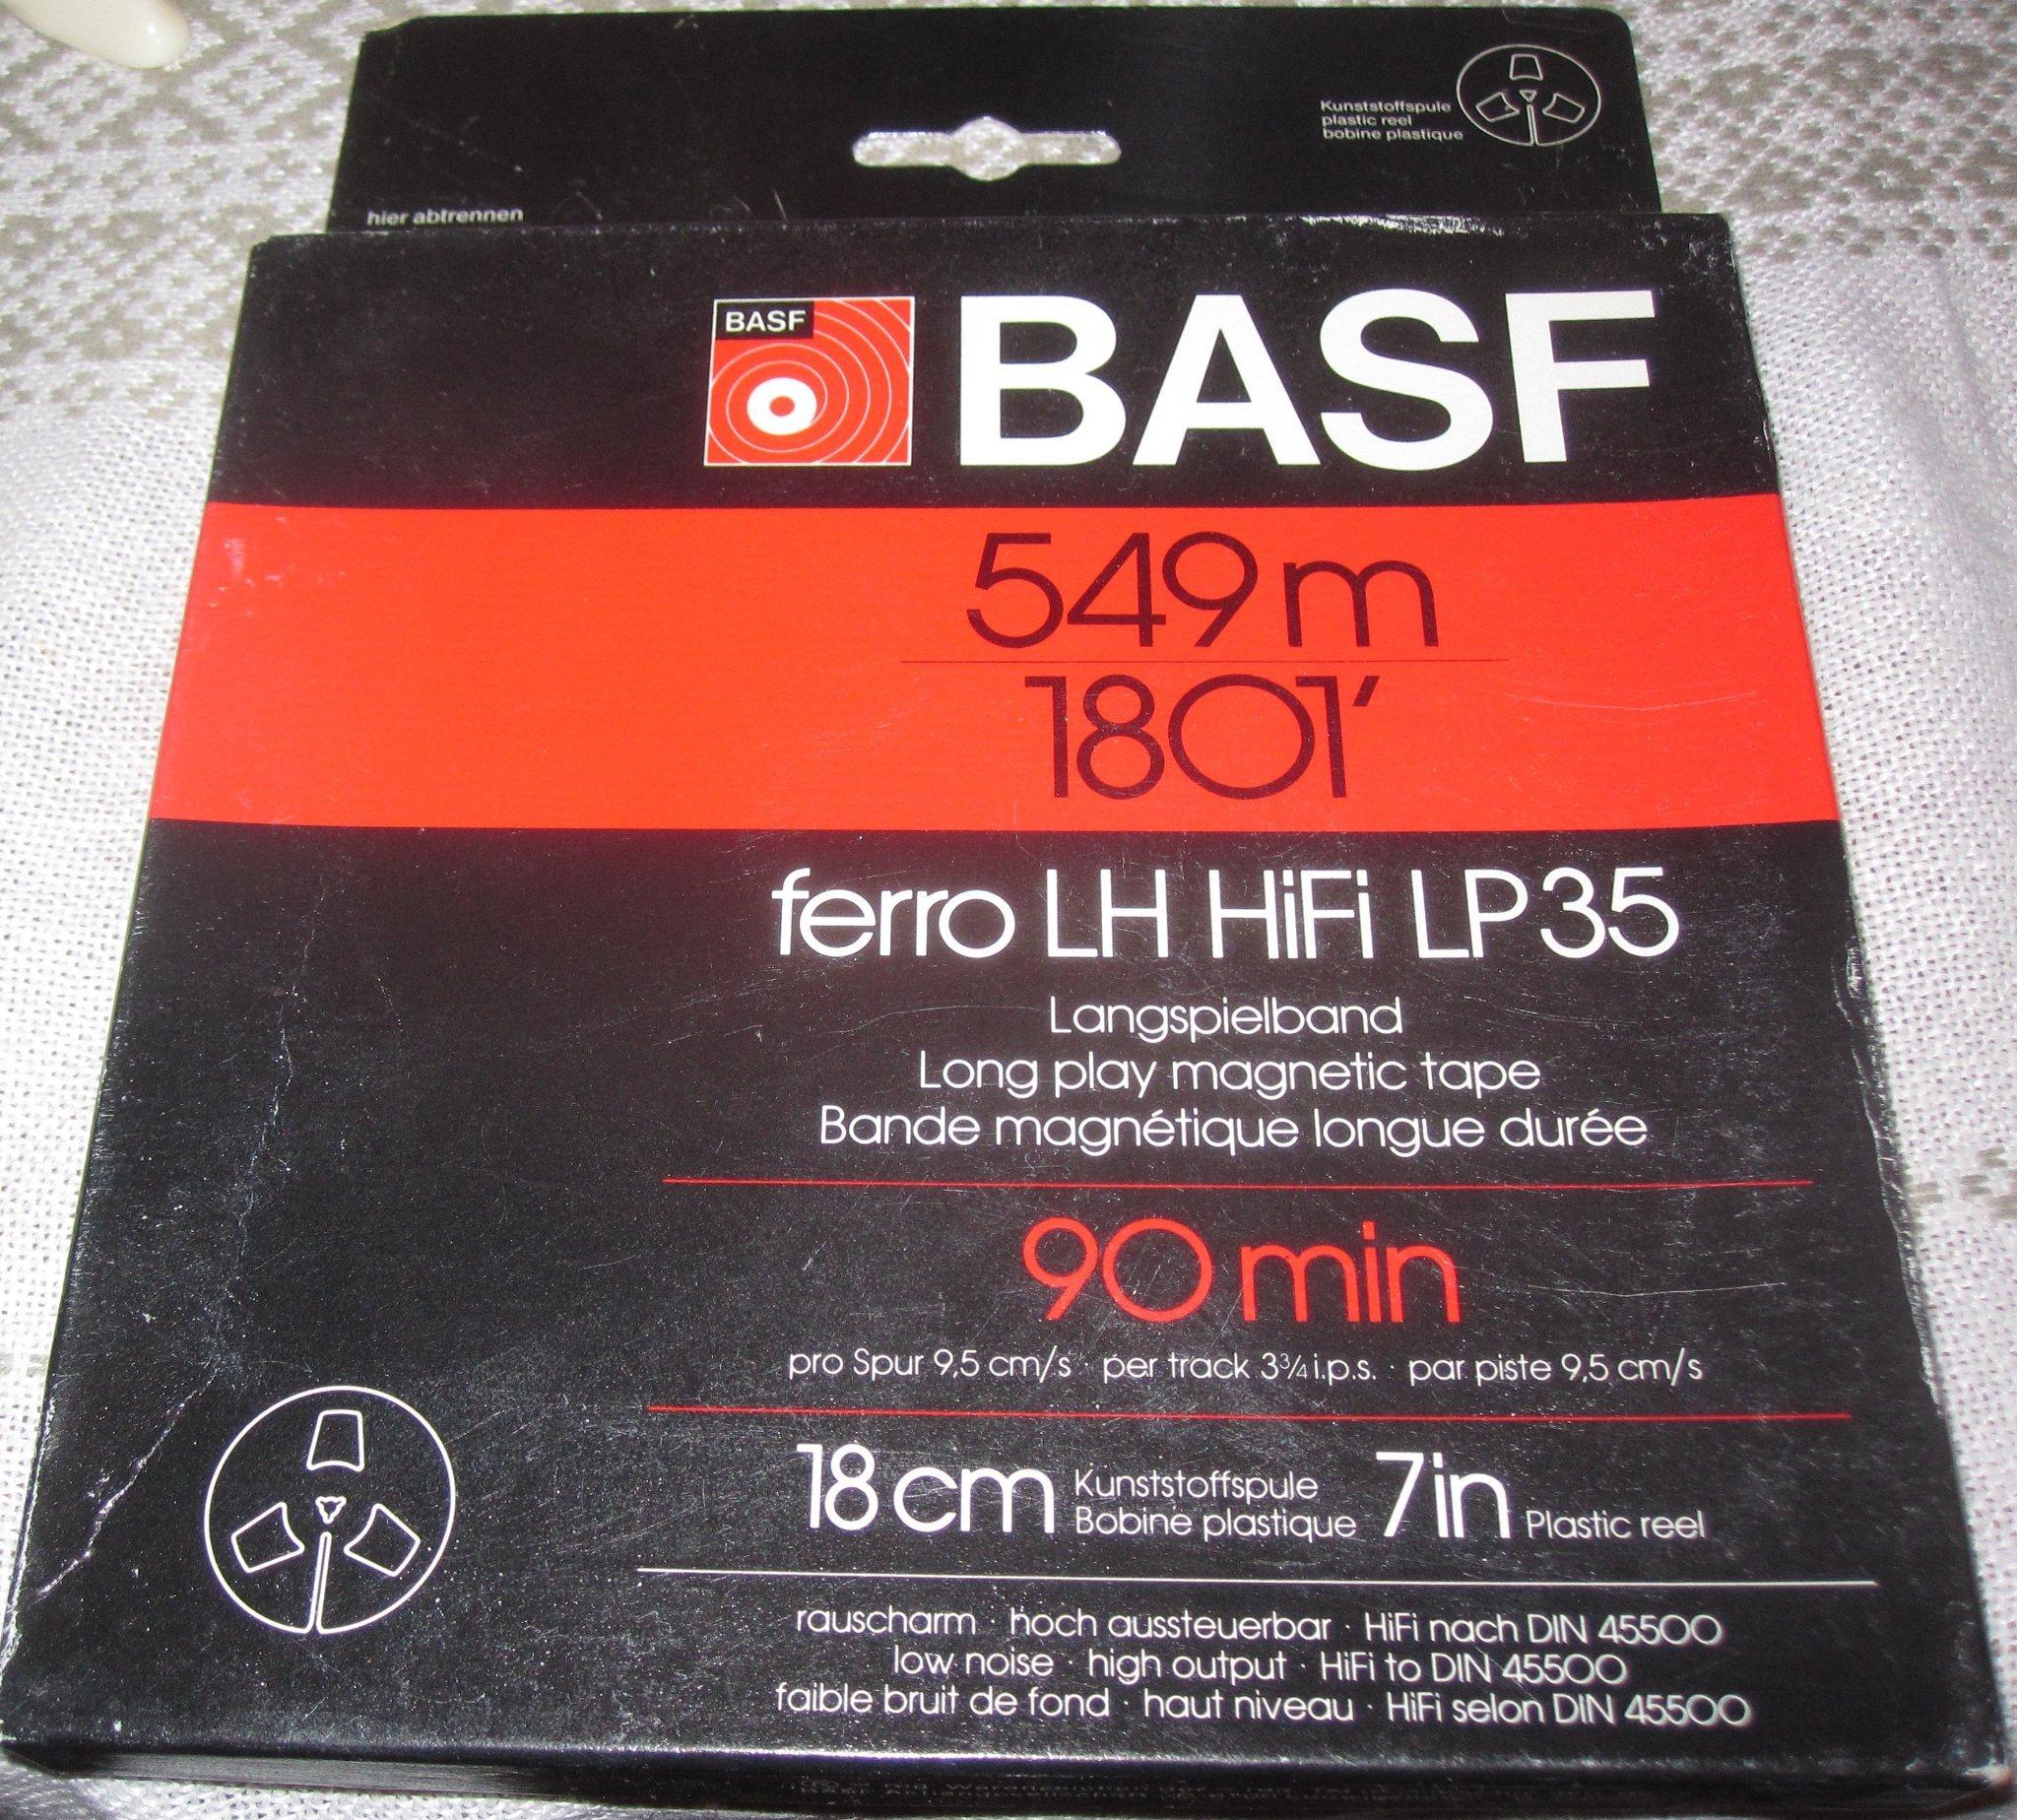 "NOS BASF ferro LH HiFi LP35 Reel-to-Reel Magnetic Tape 90min 549m//1801/' 18cm//7/"""